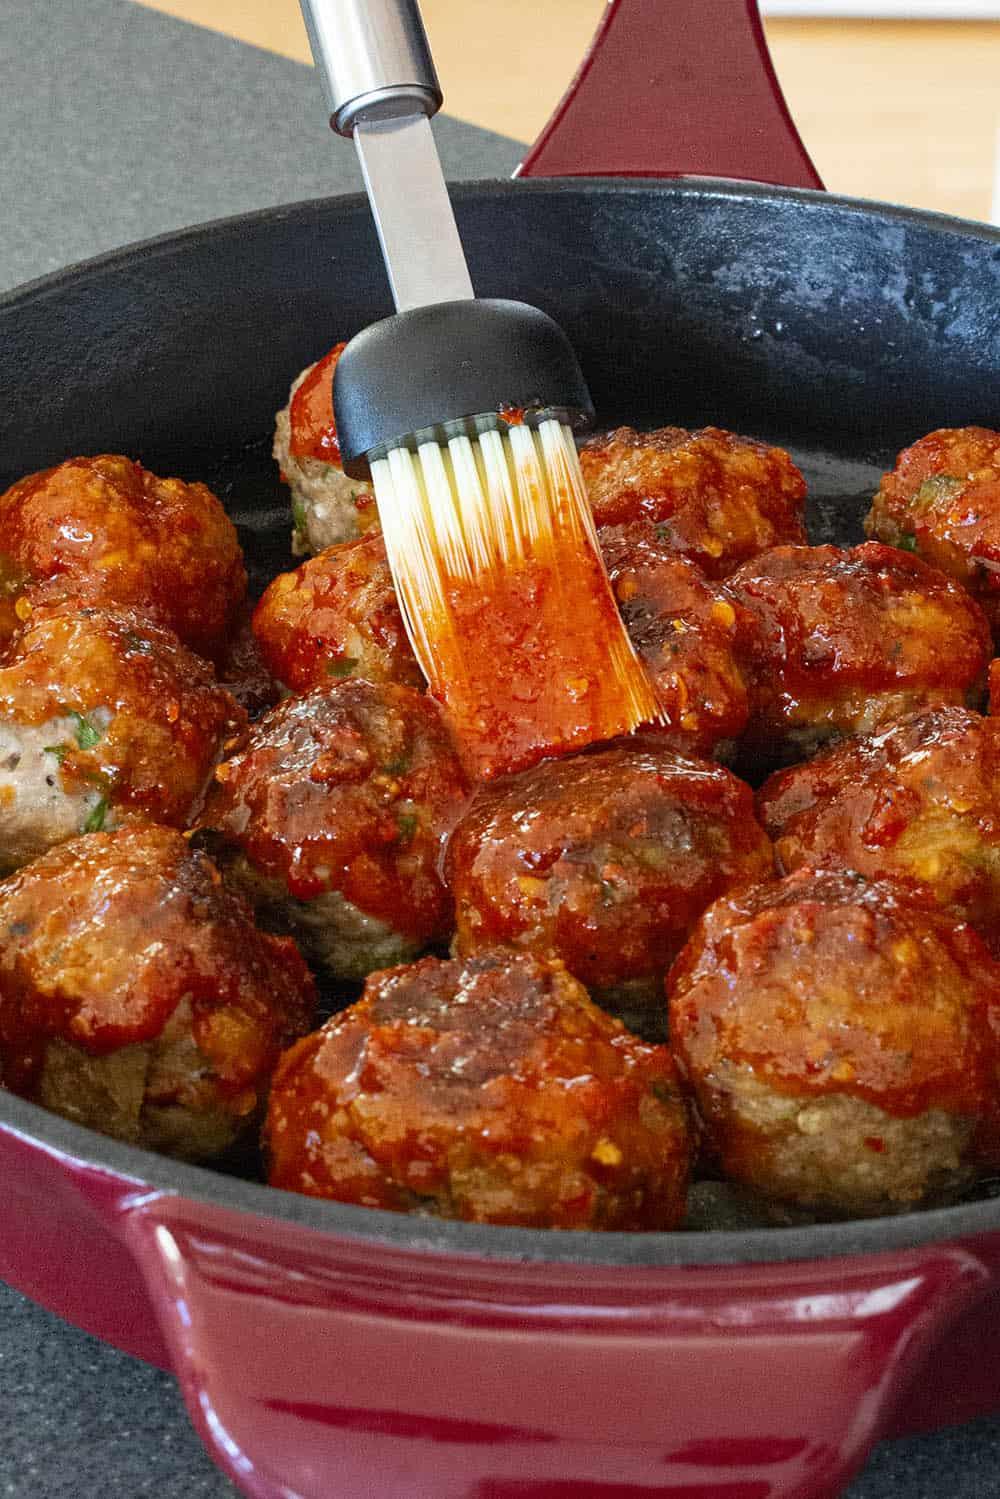 Brushing the honey-sriracha glaze over the turkey meatballs